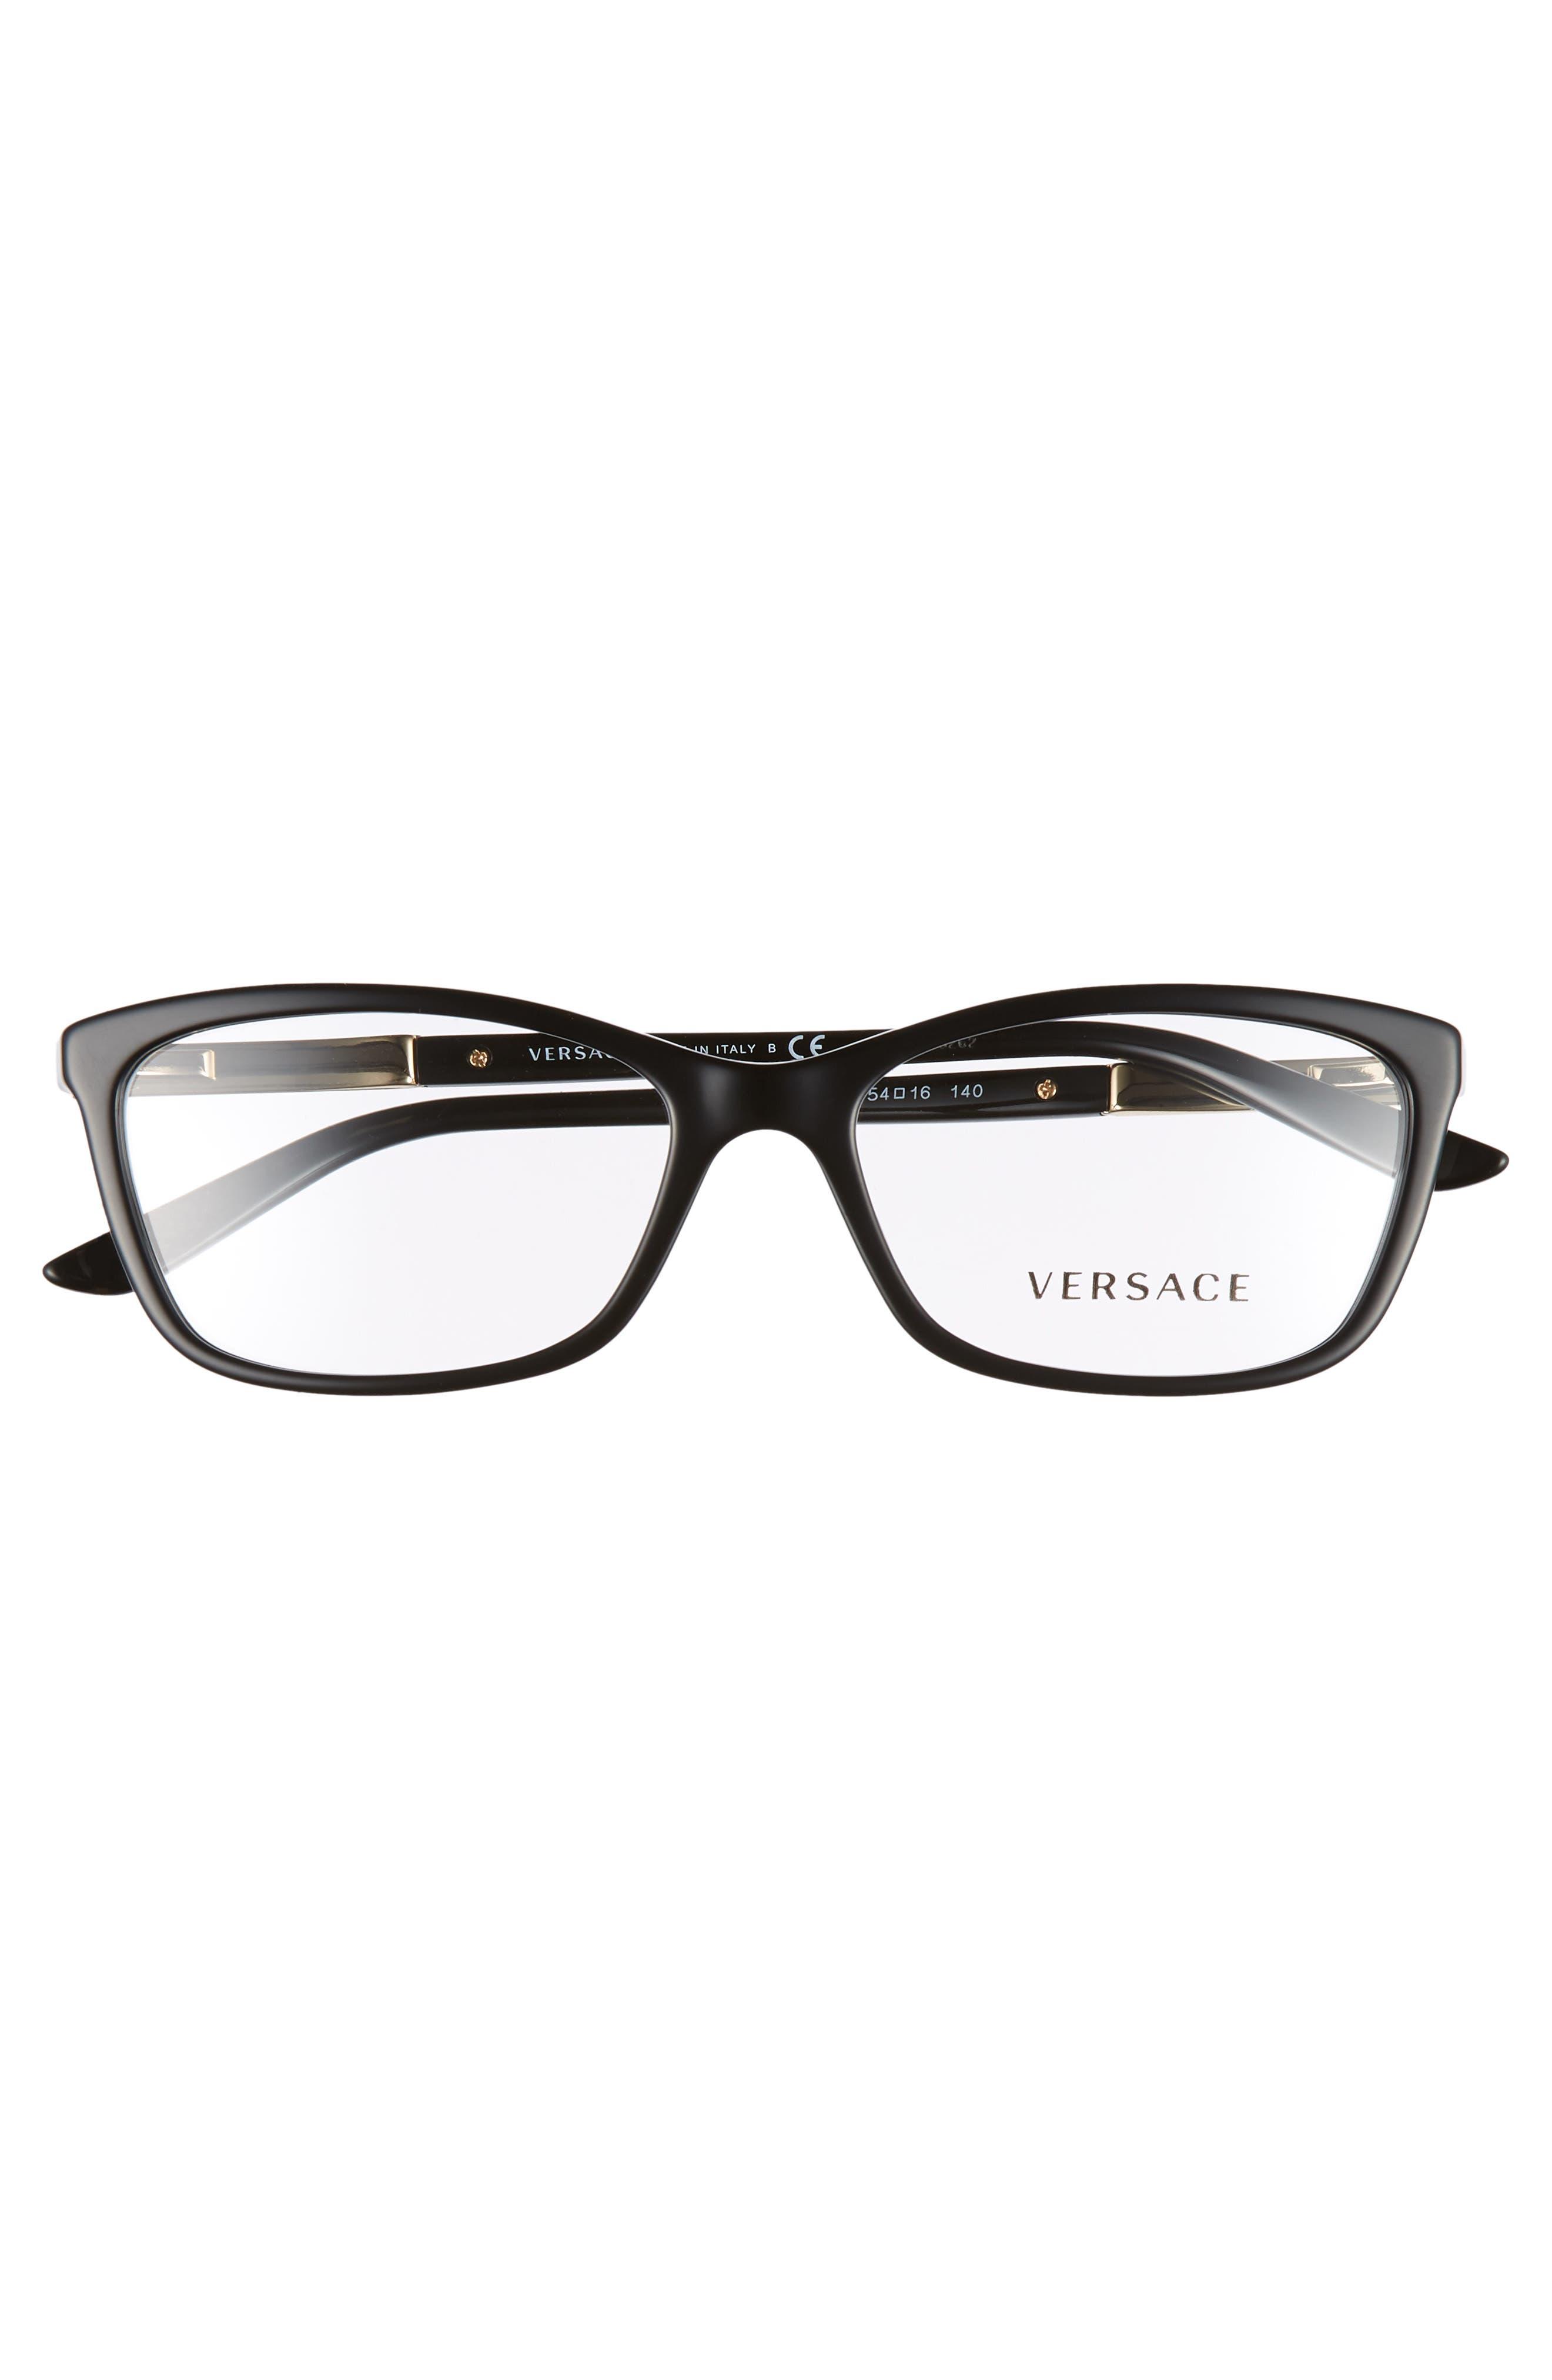 VERSACE,                             54mm Optical Glasses,                             Alternate thumbnail 3, color,                             BLACK